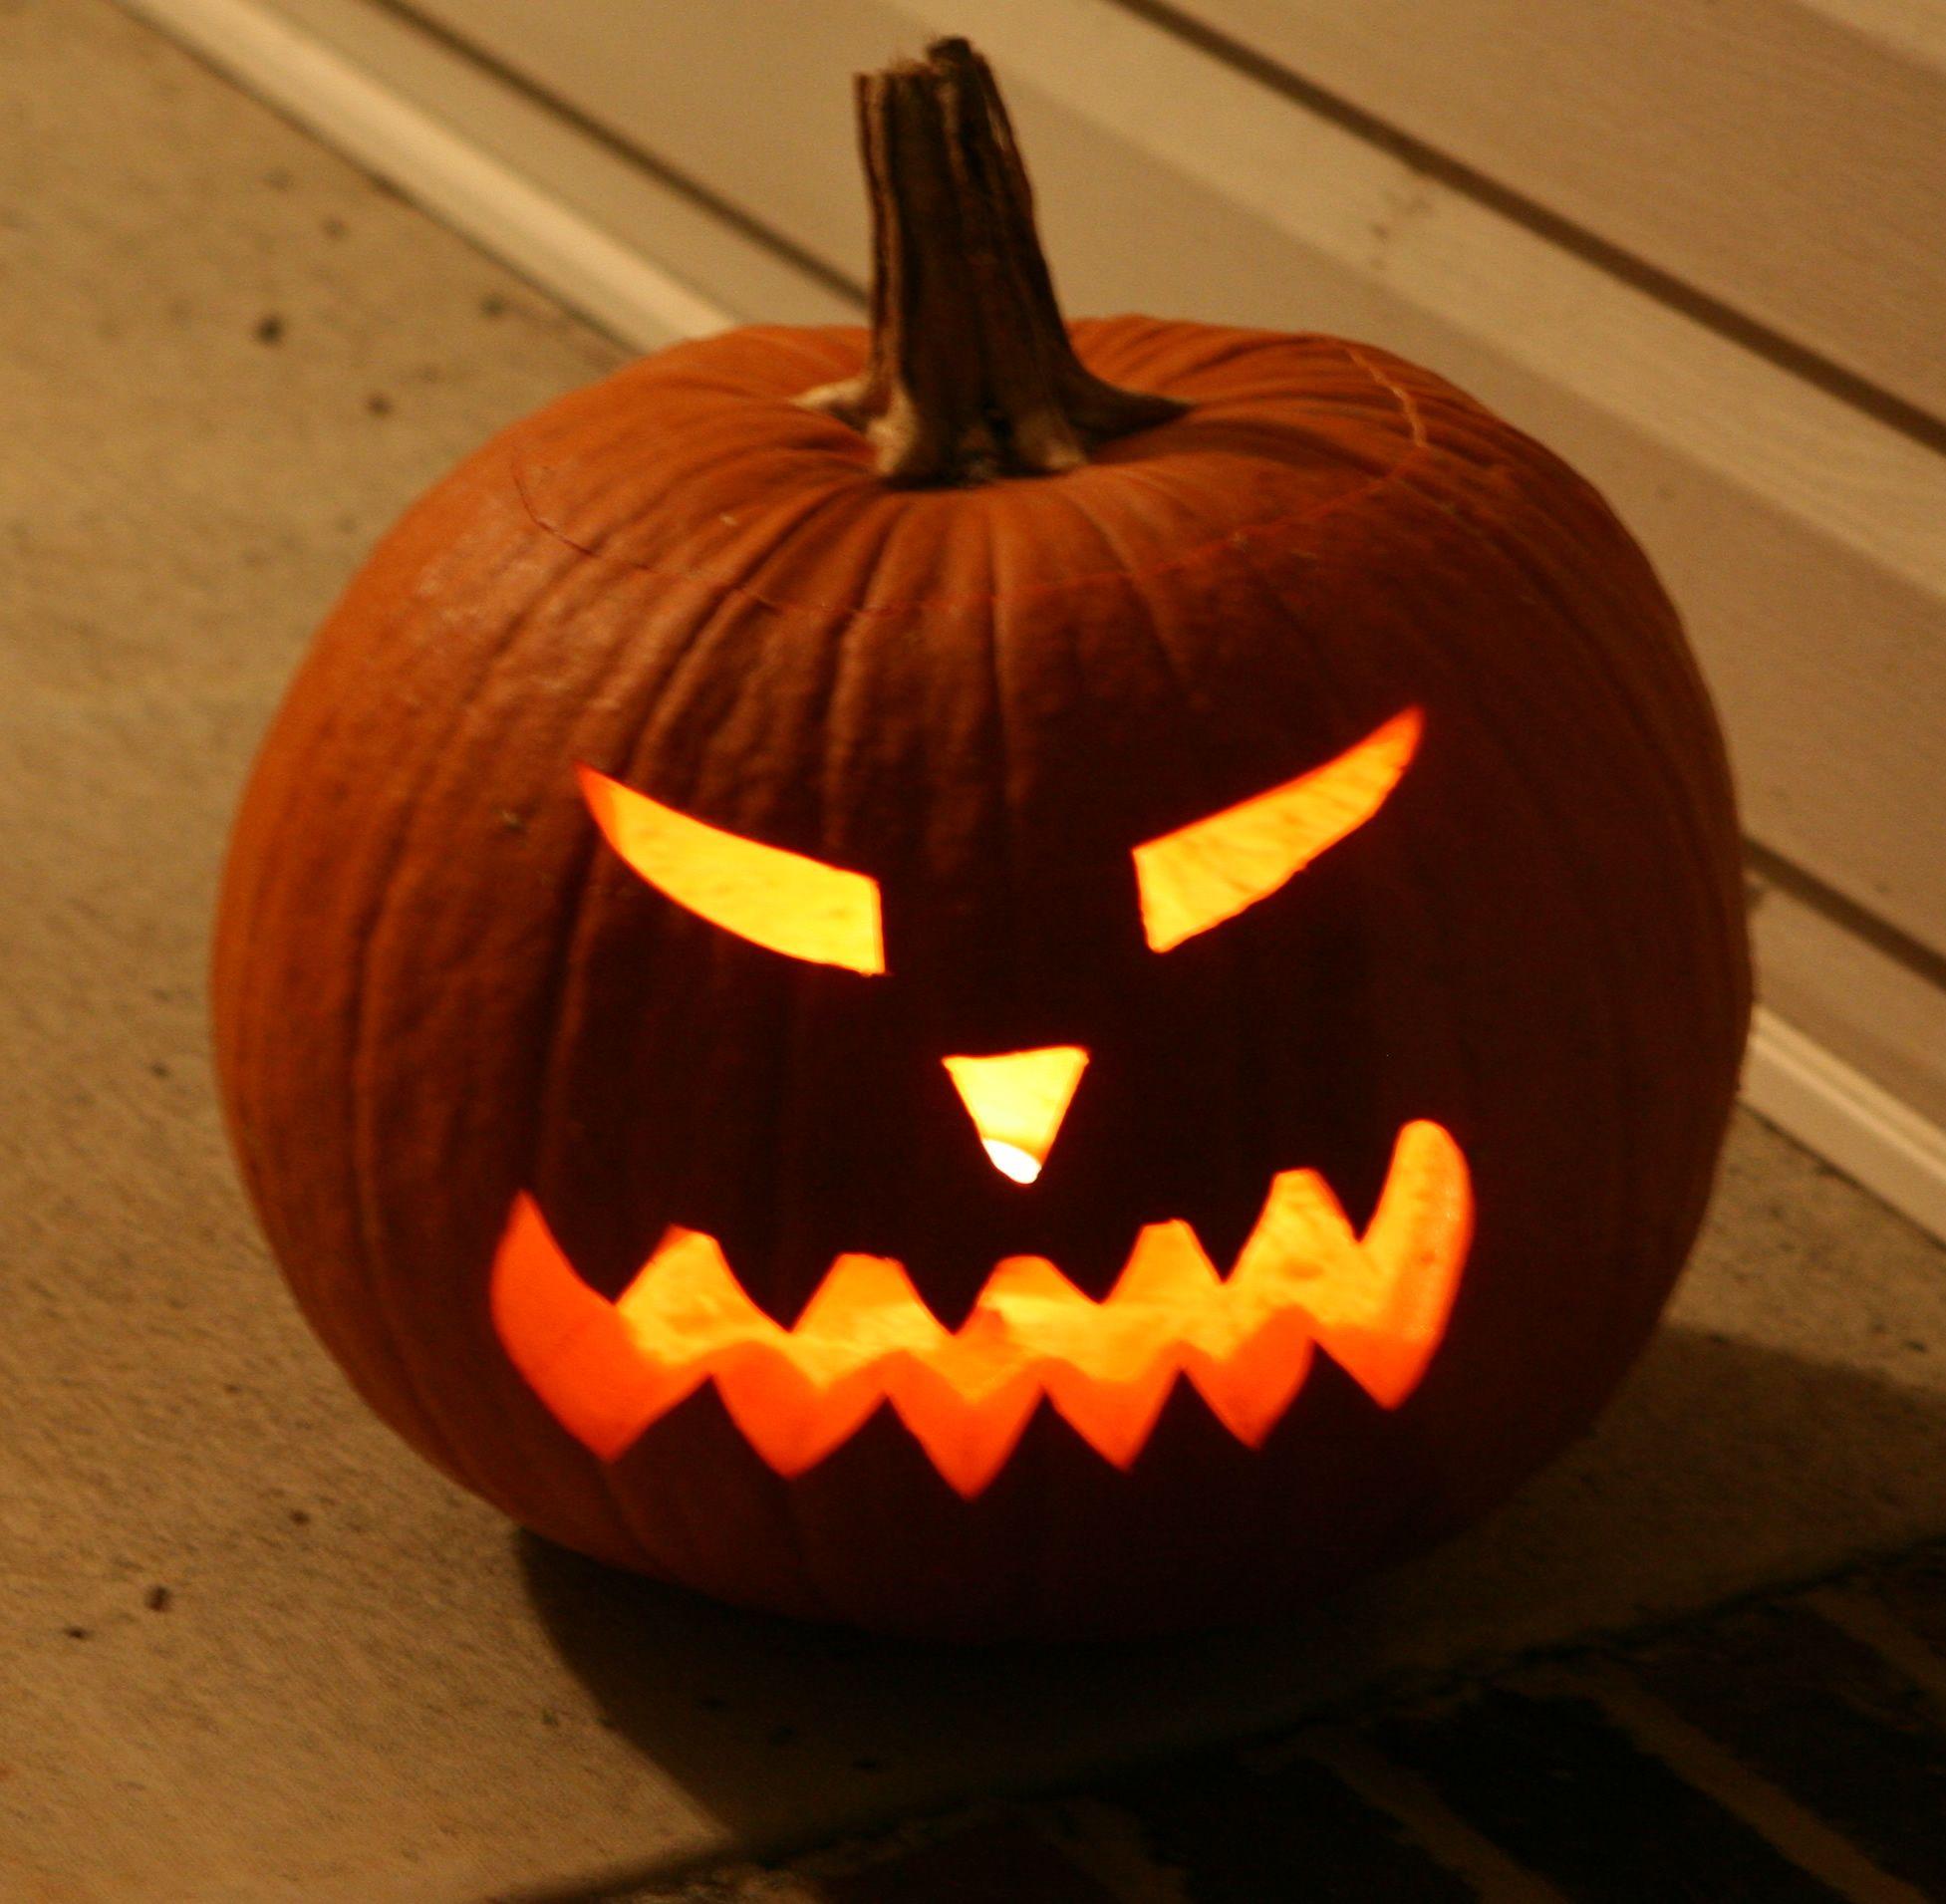 Spooky Jack O Lantern Patterns Templates Jack O Lantern